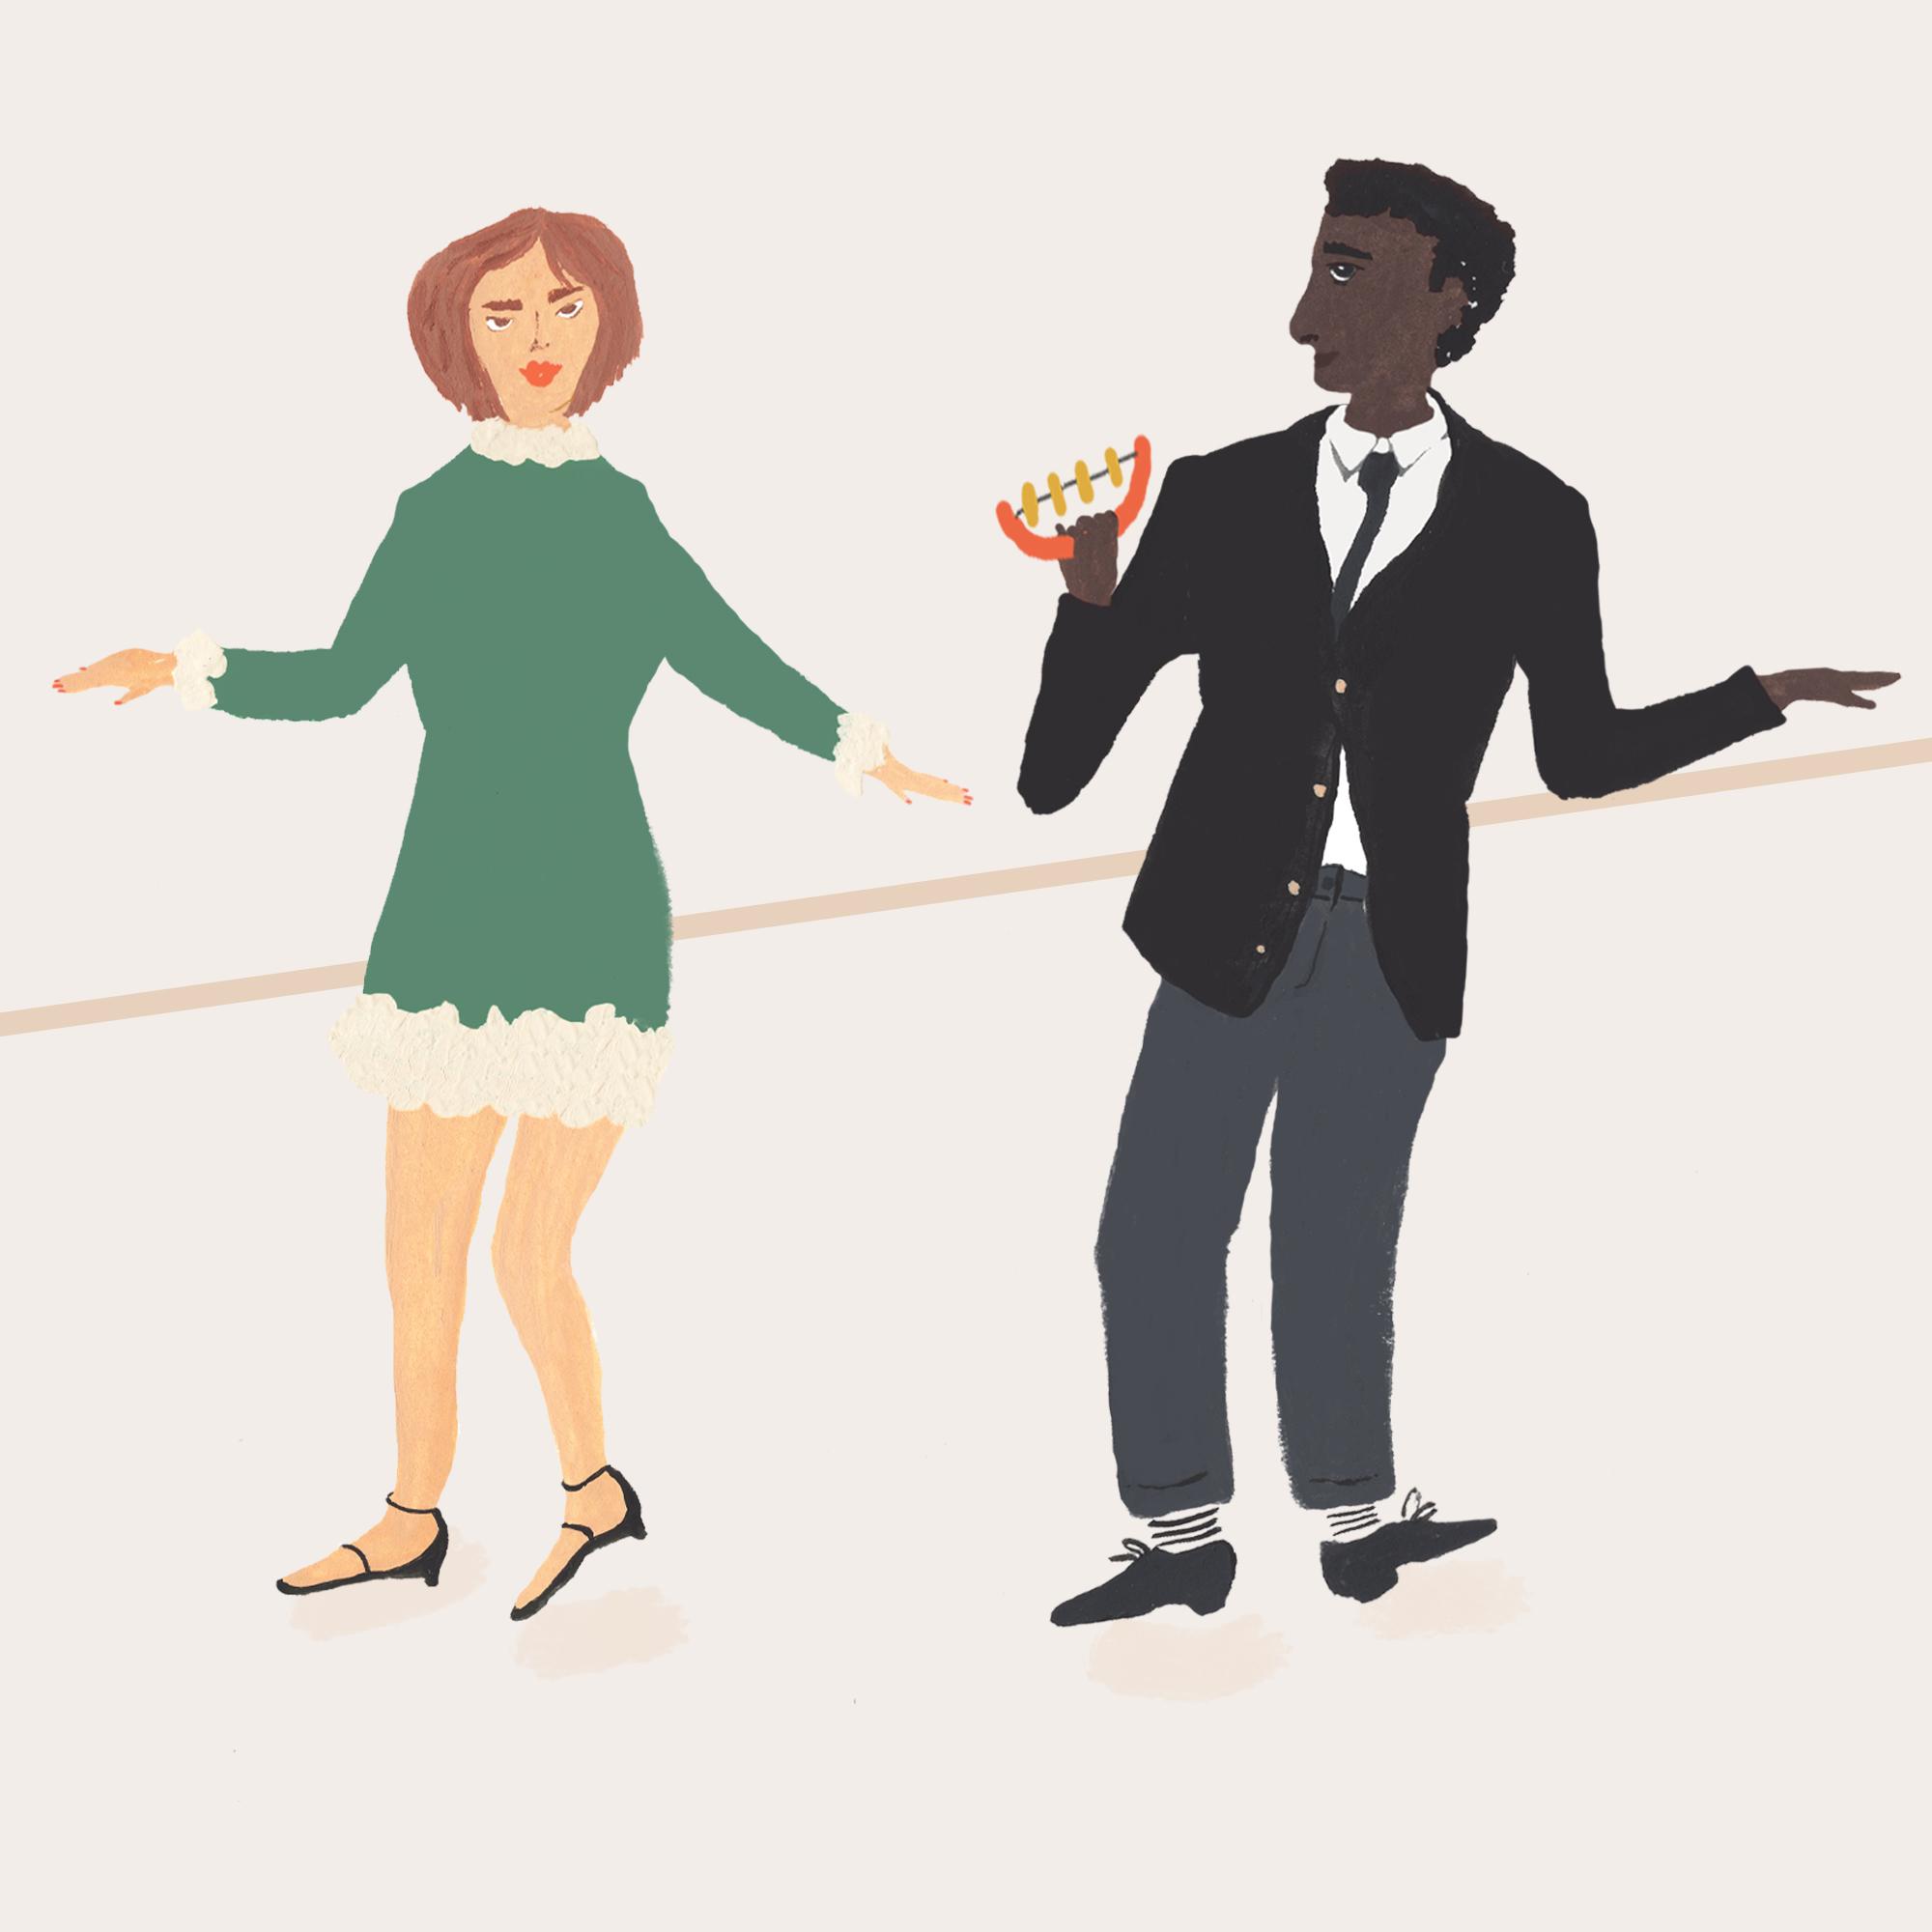 Valentines idea: Take a dance class